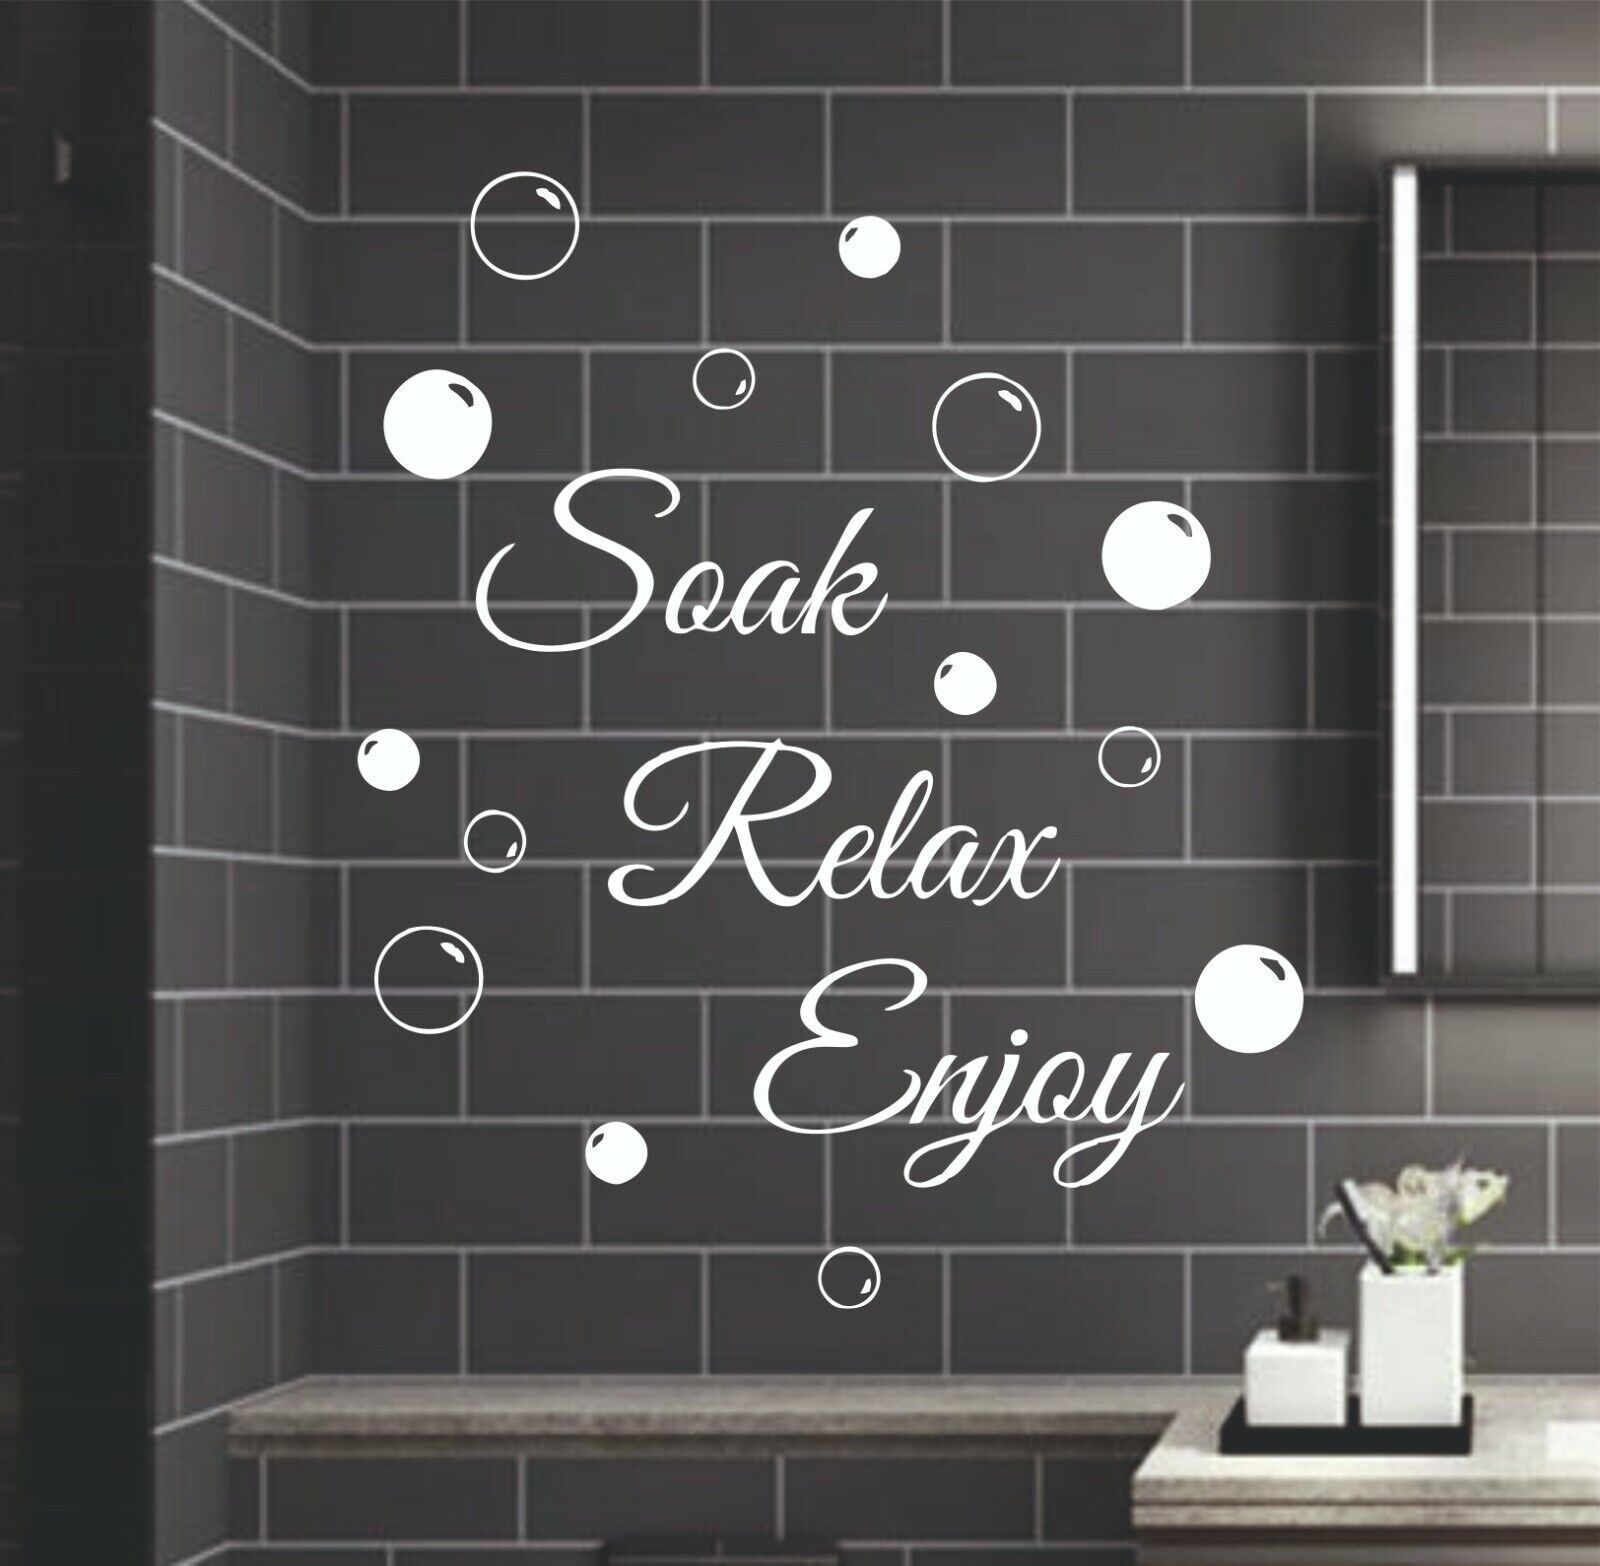 Home Decoration - Soak Relax Enjoy Wall Stickers & Bubbles Decals Bathroom Home Art Decor